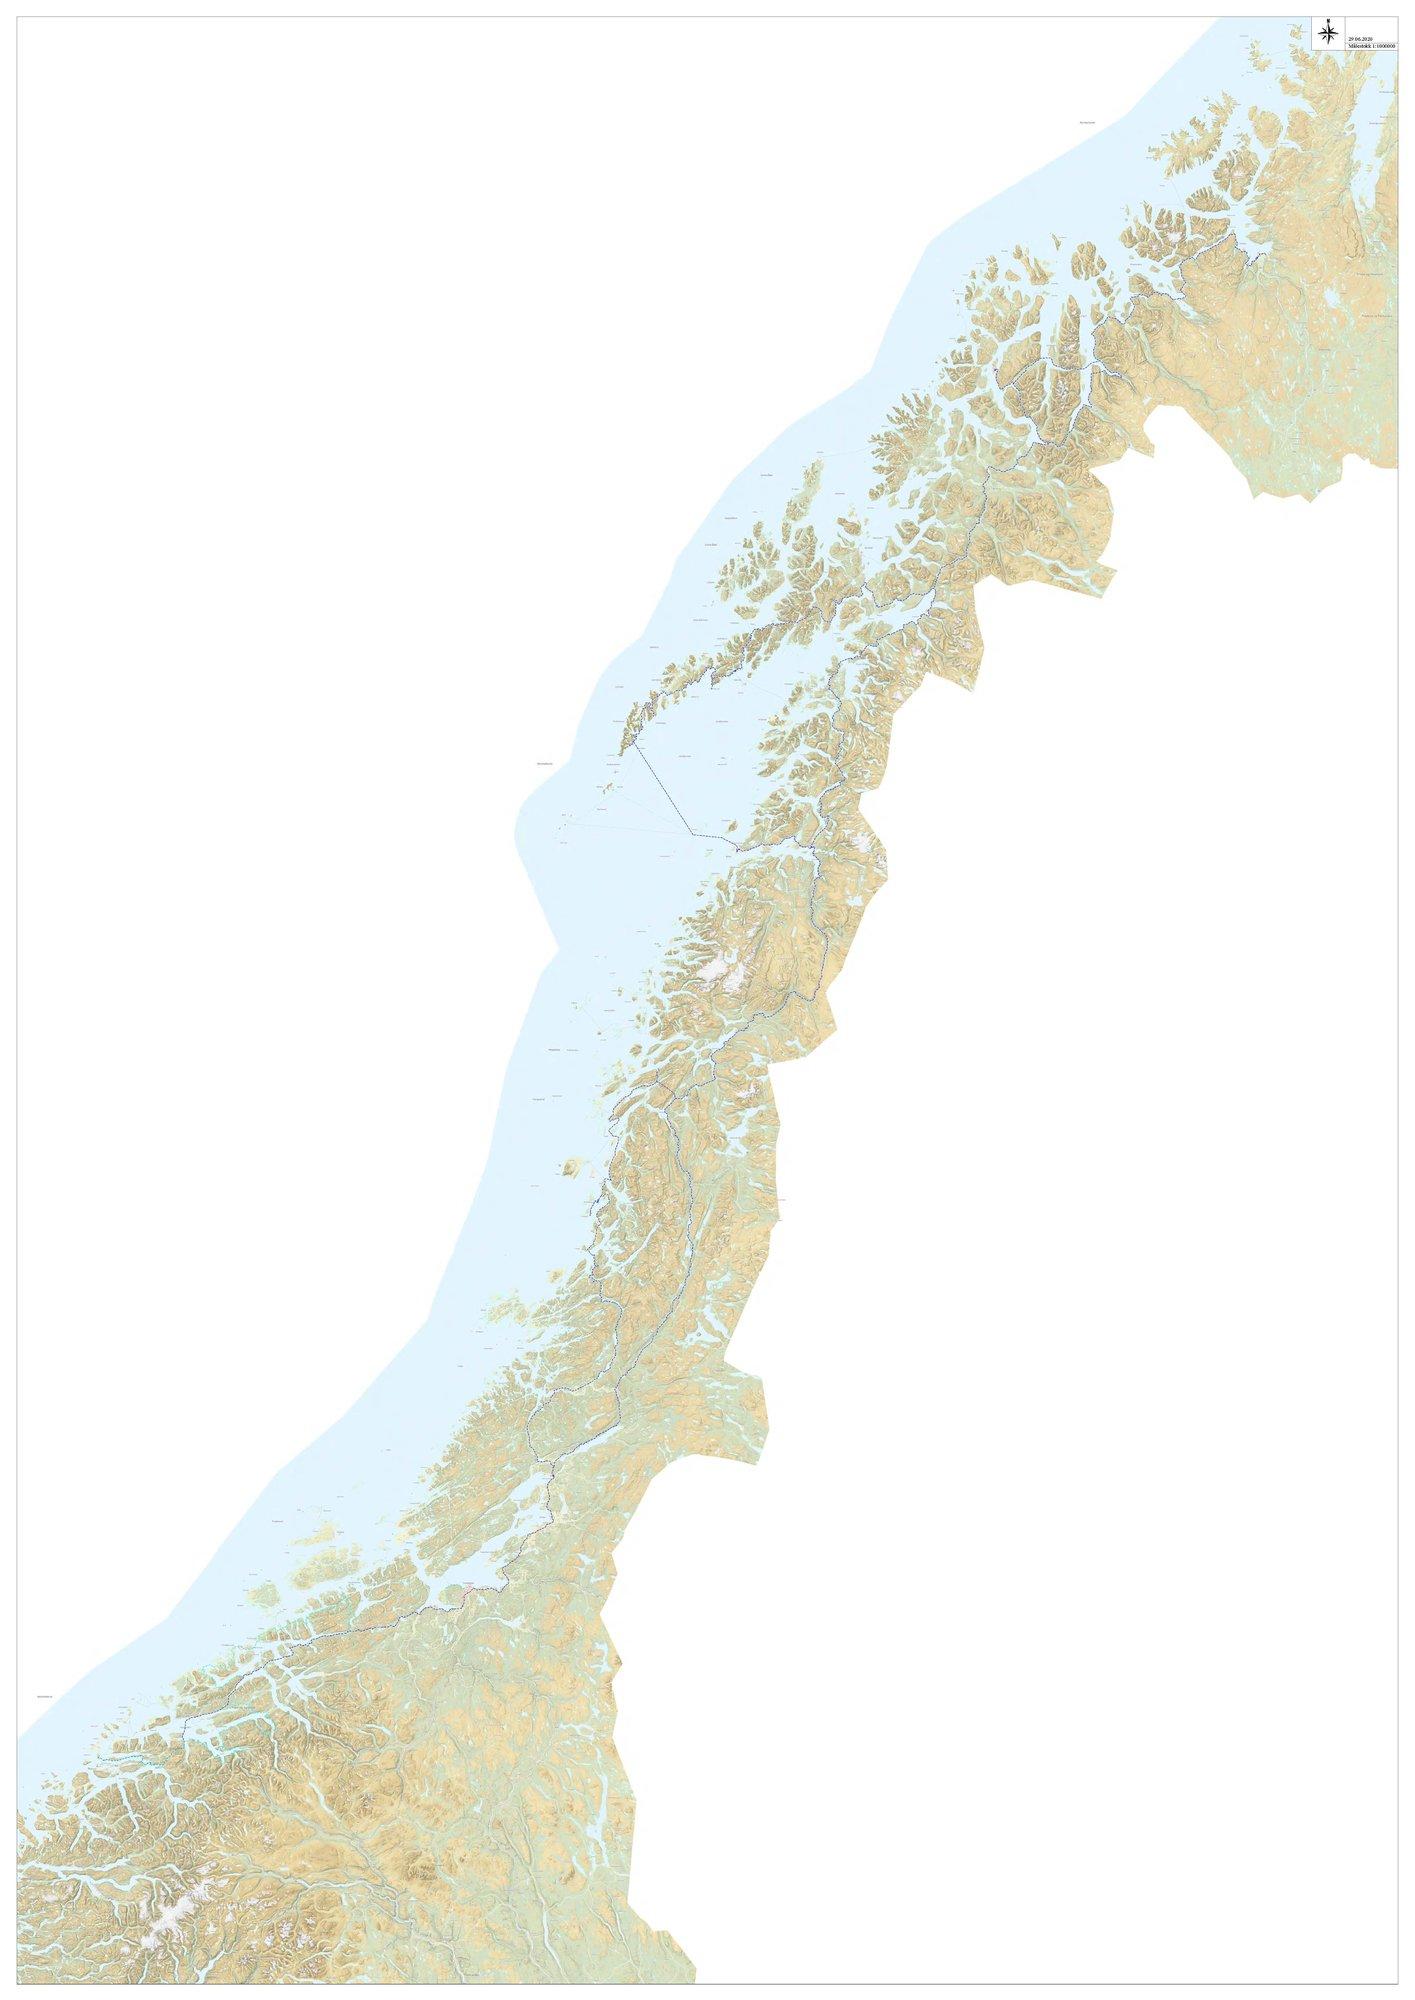 Kart_2020.06.29_b_.jpg